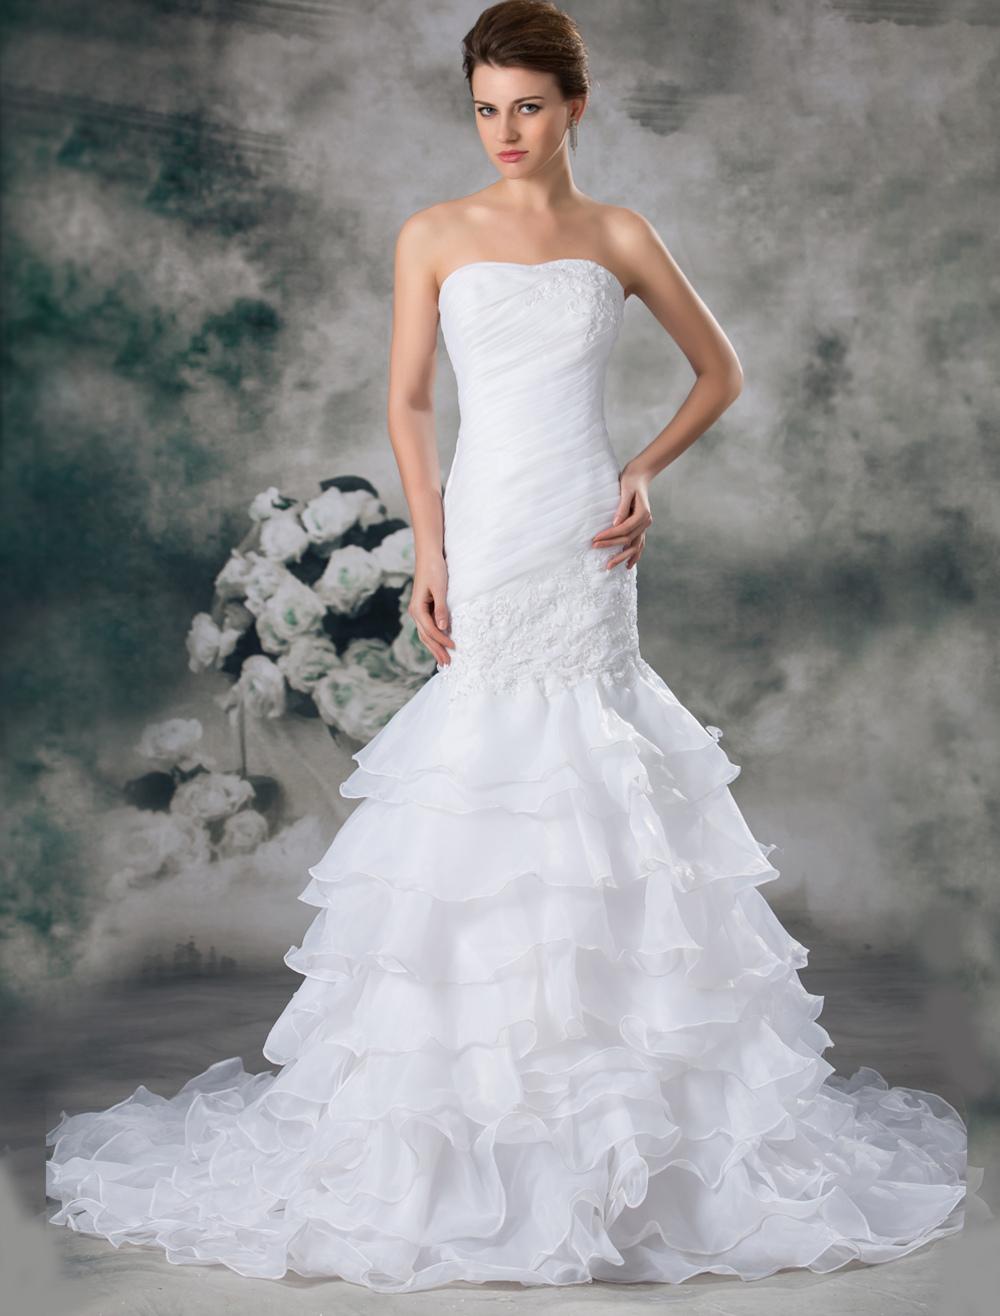 White Mermaid Strapless Bride's Wedding Dress photo